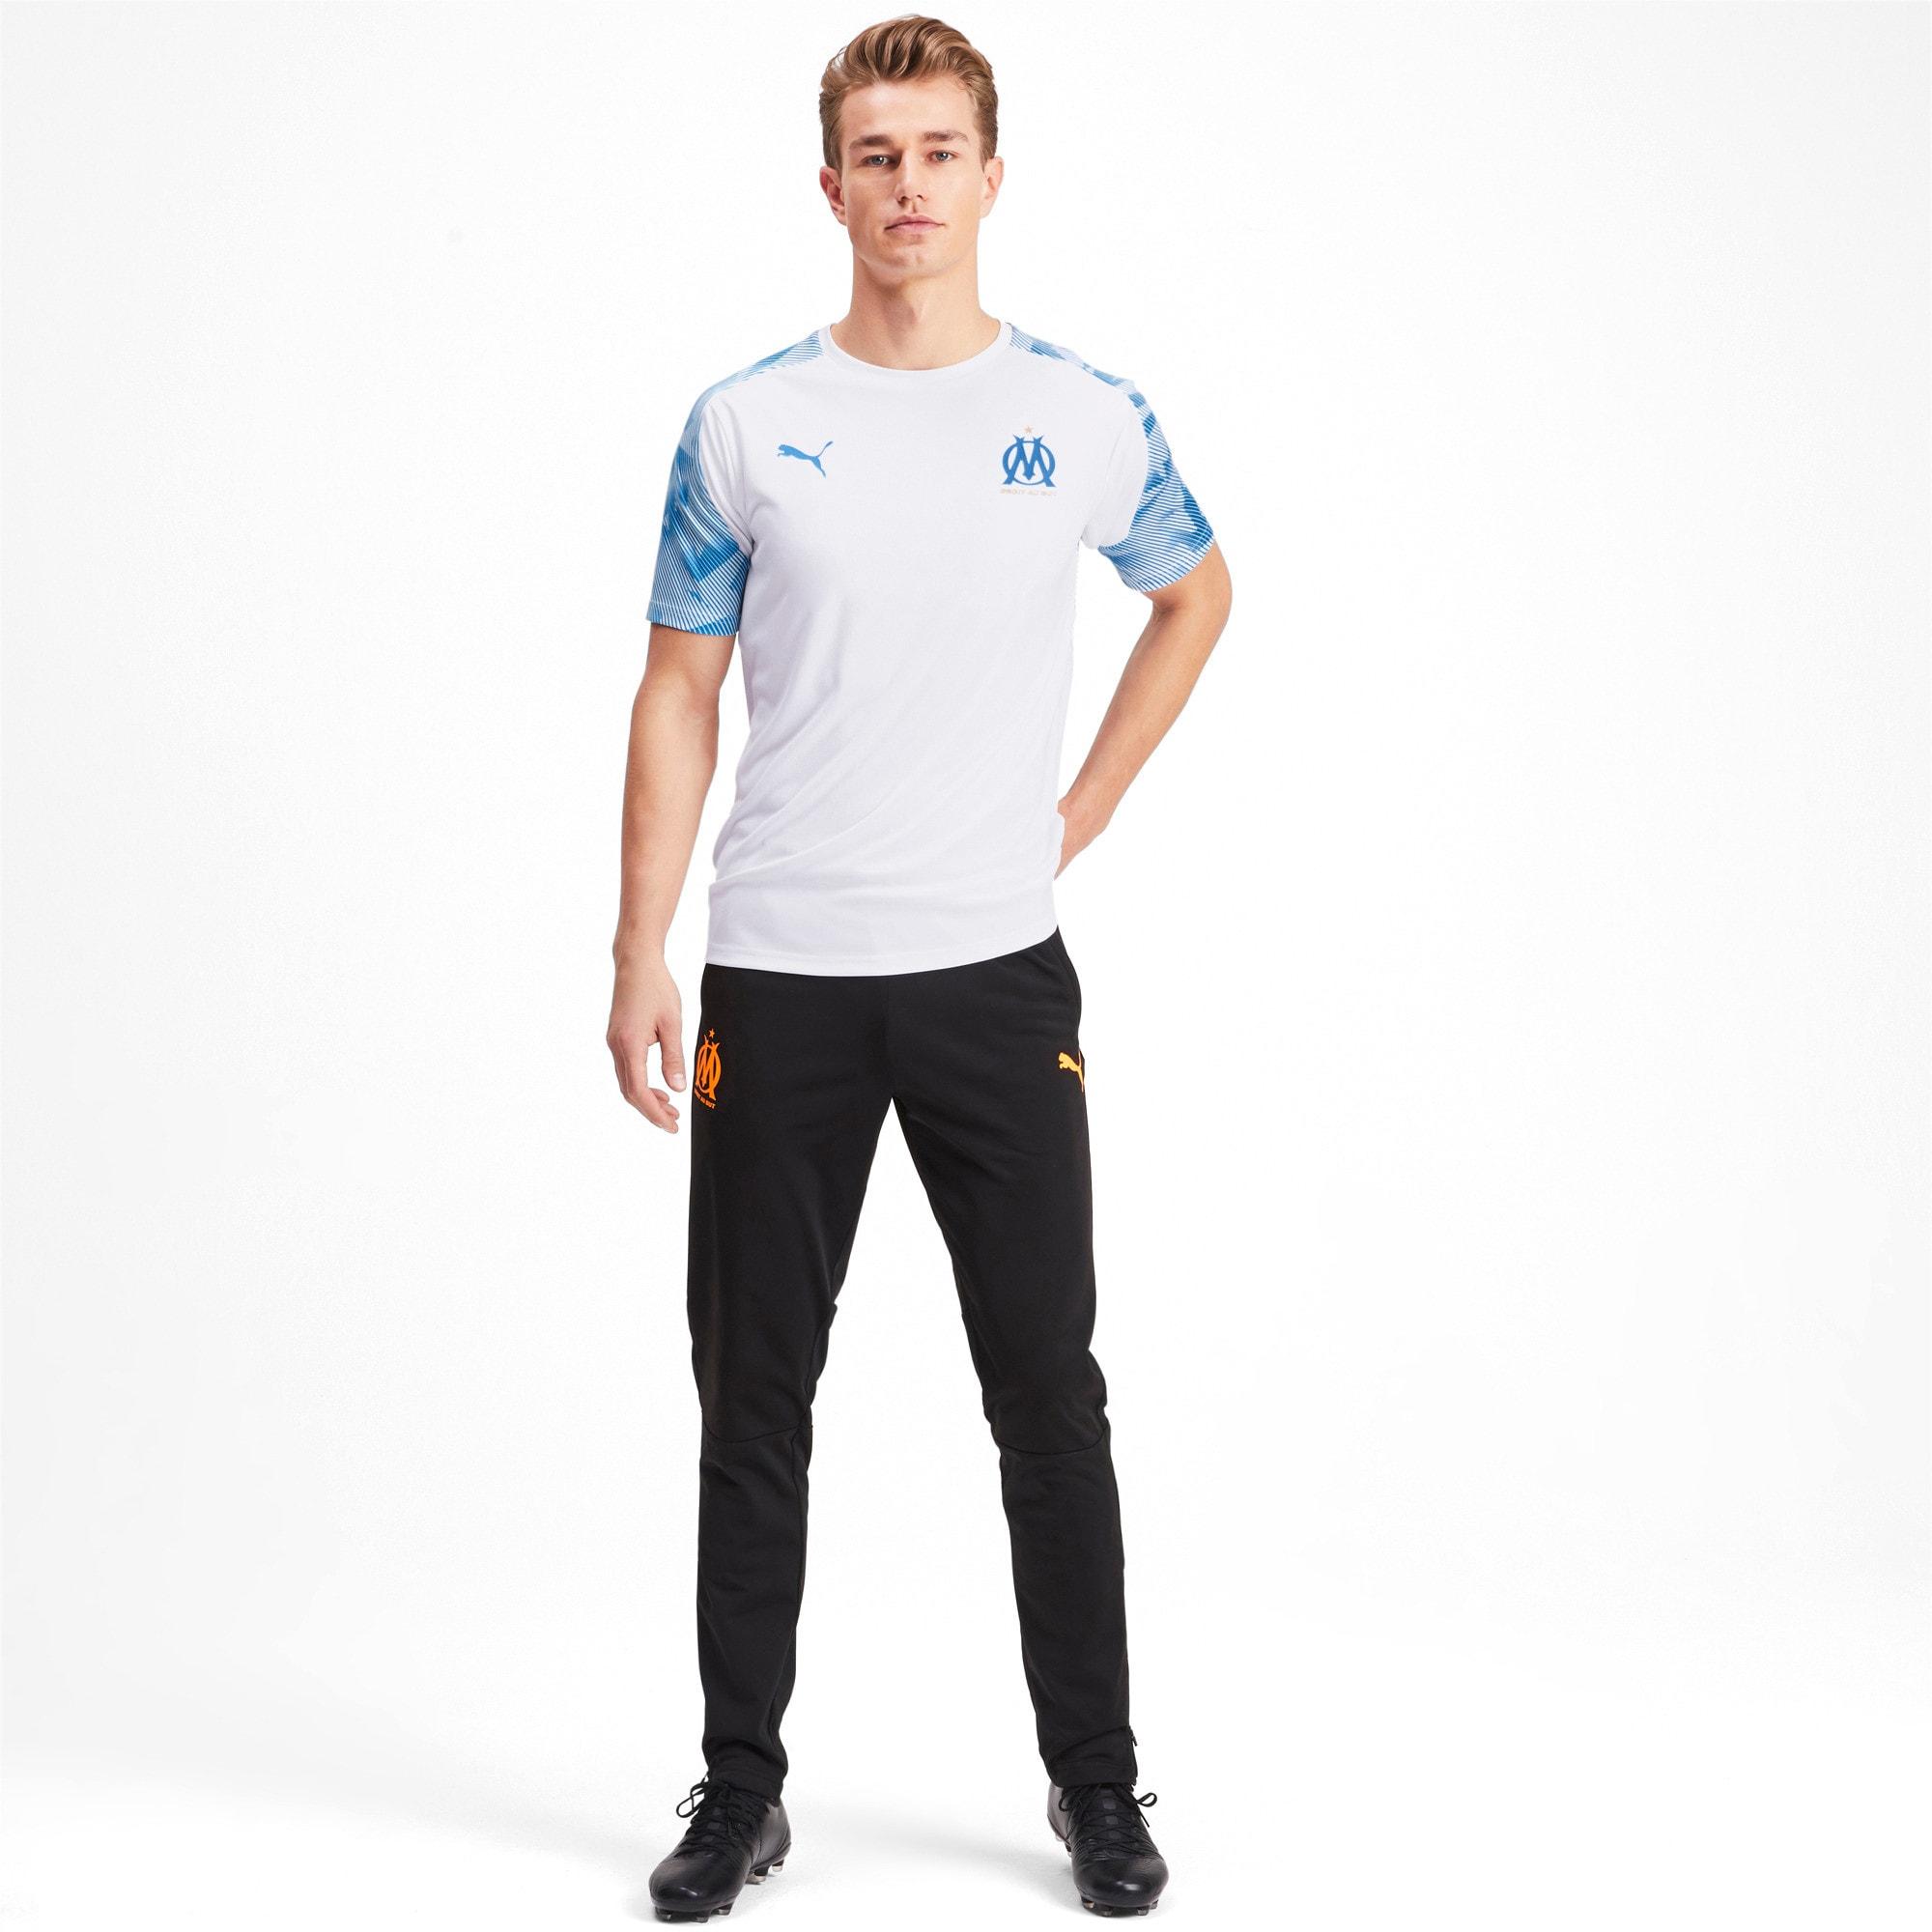 Thumbnail 3 of Olympique de Marseille Men's Training Jersey, Puma White-Bleu Azur, medium